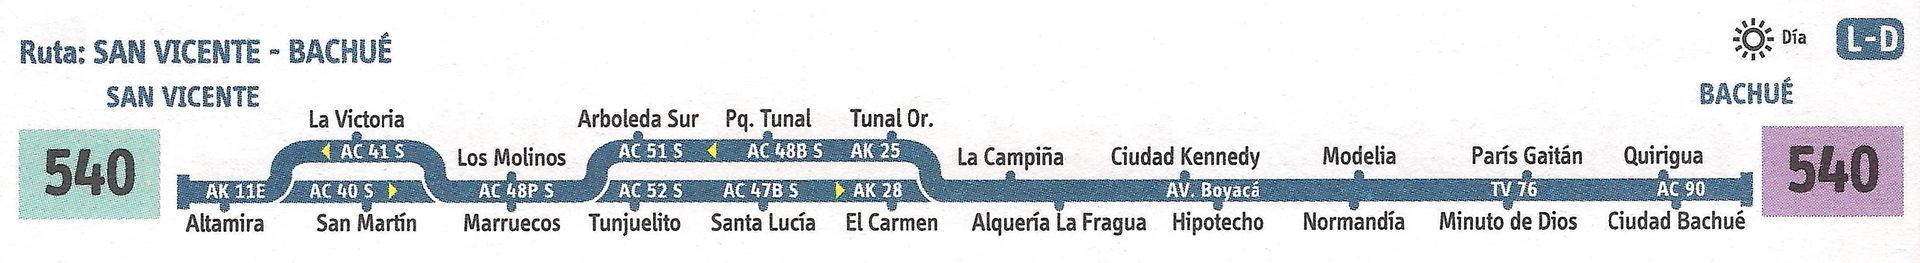 Ruta SITP: 540 Bachué ↔ San Vicente [Urbana] 3